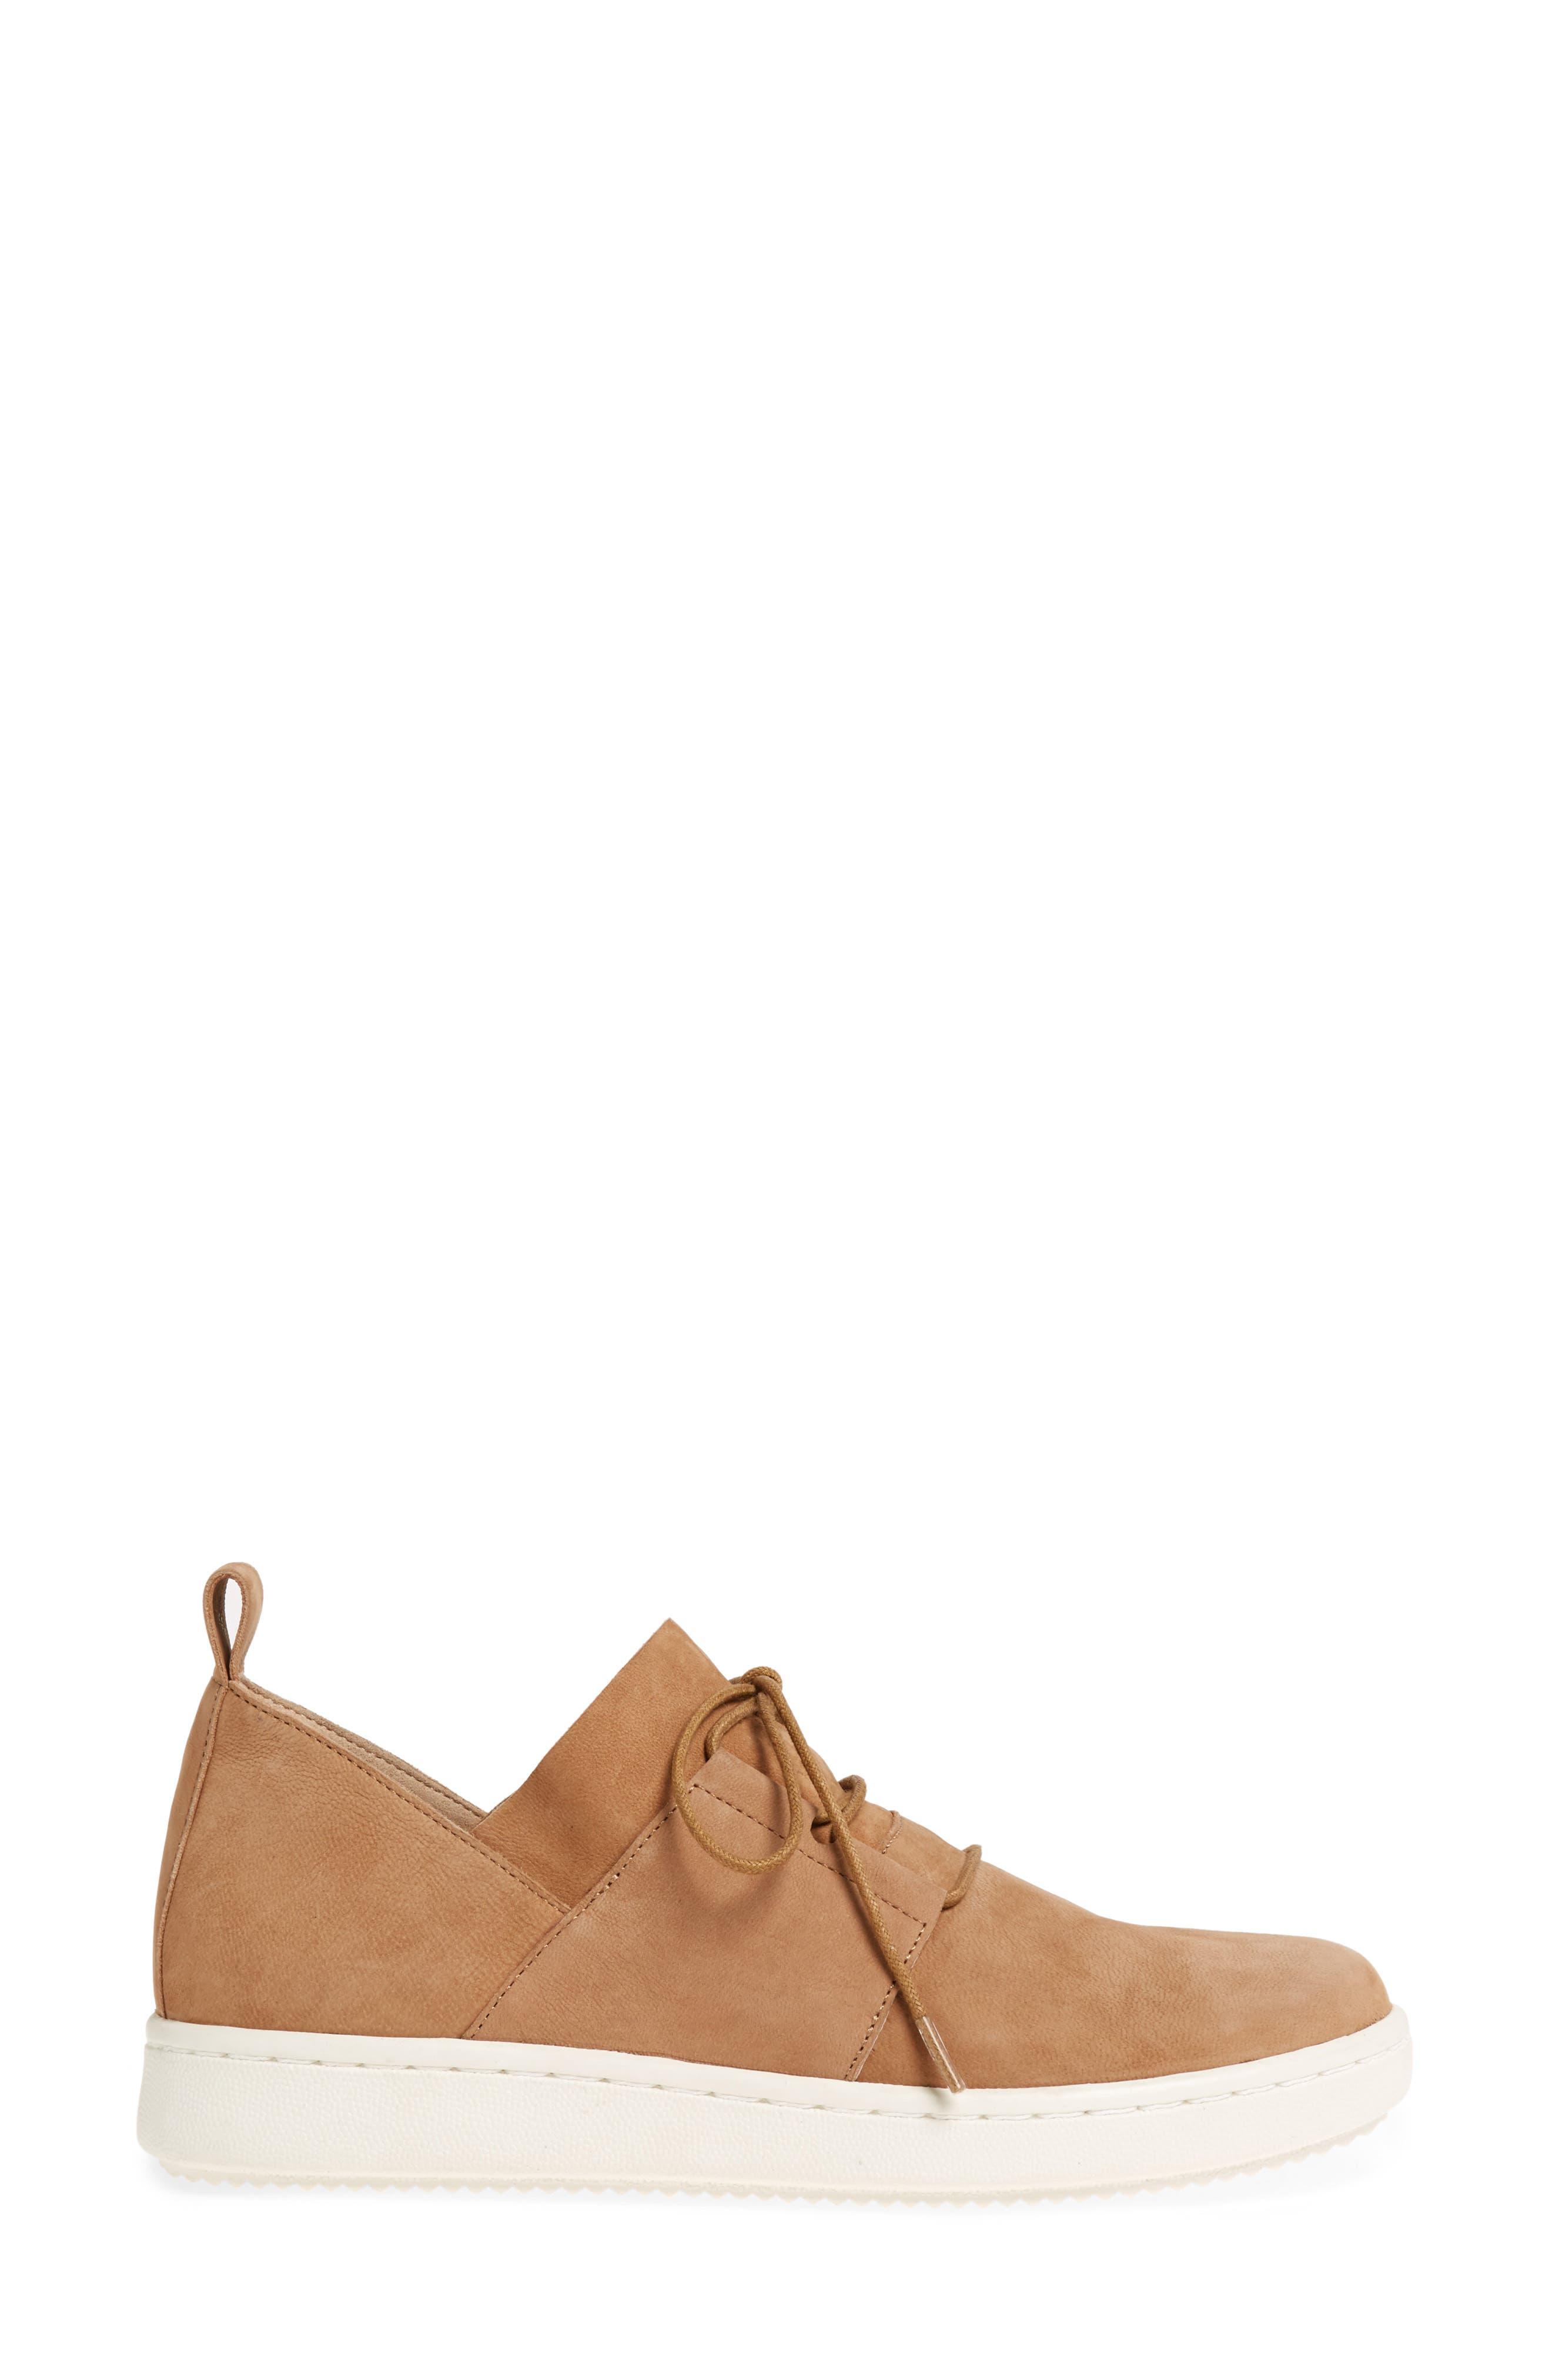 Alternate Image 3  - Eileen Fisher Kipling Sneaker (Women)